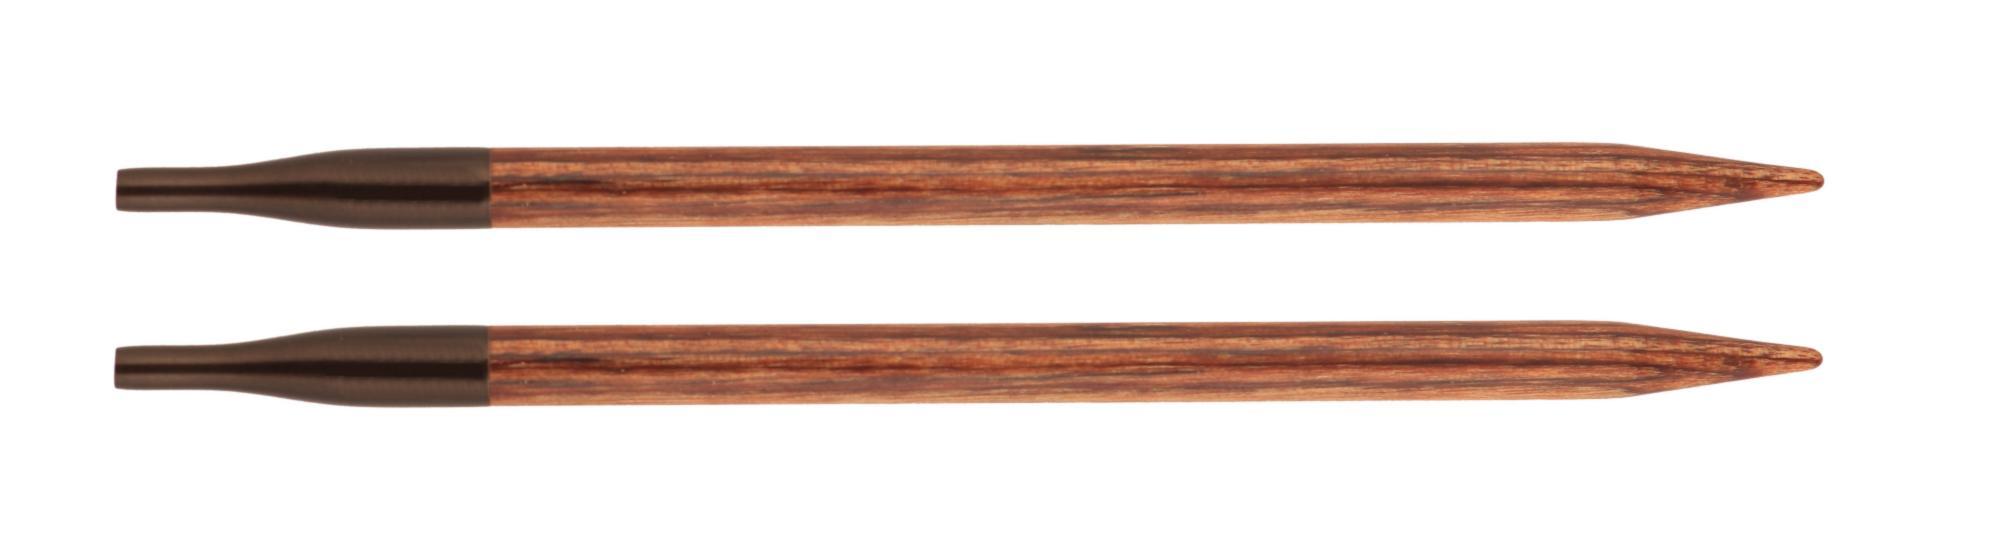 31226 Спицы съемные короткие 4.50 мм Ginger KnitPro